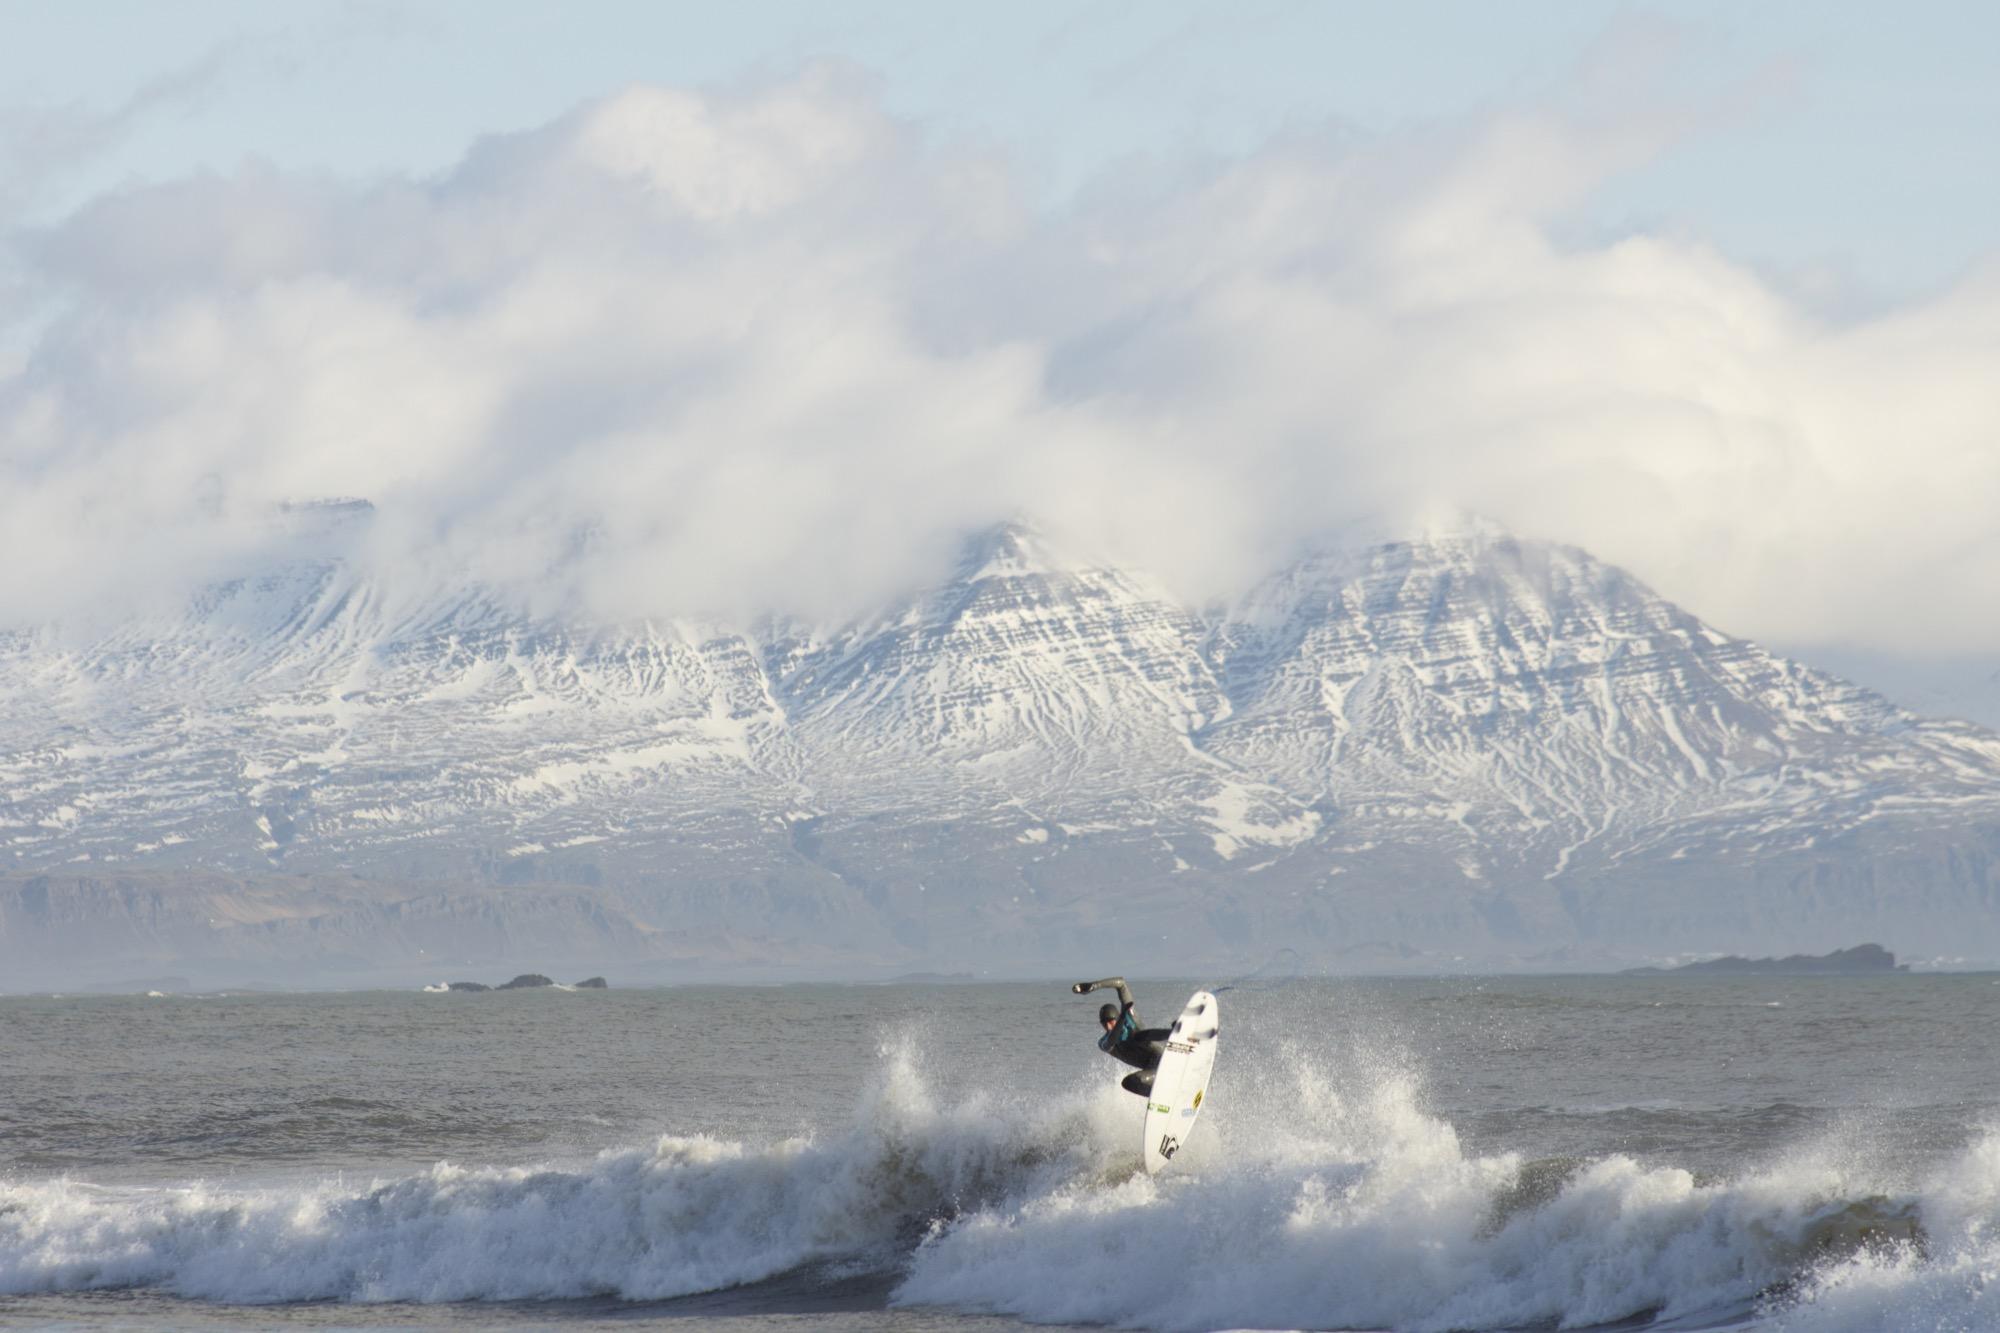 Brett Barley, Vik Iceland Water temp: 42° F / 6° C Air temp: 40° F / 4° C Photo by Chris Burkard